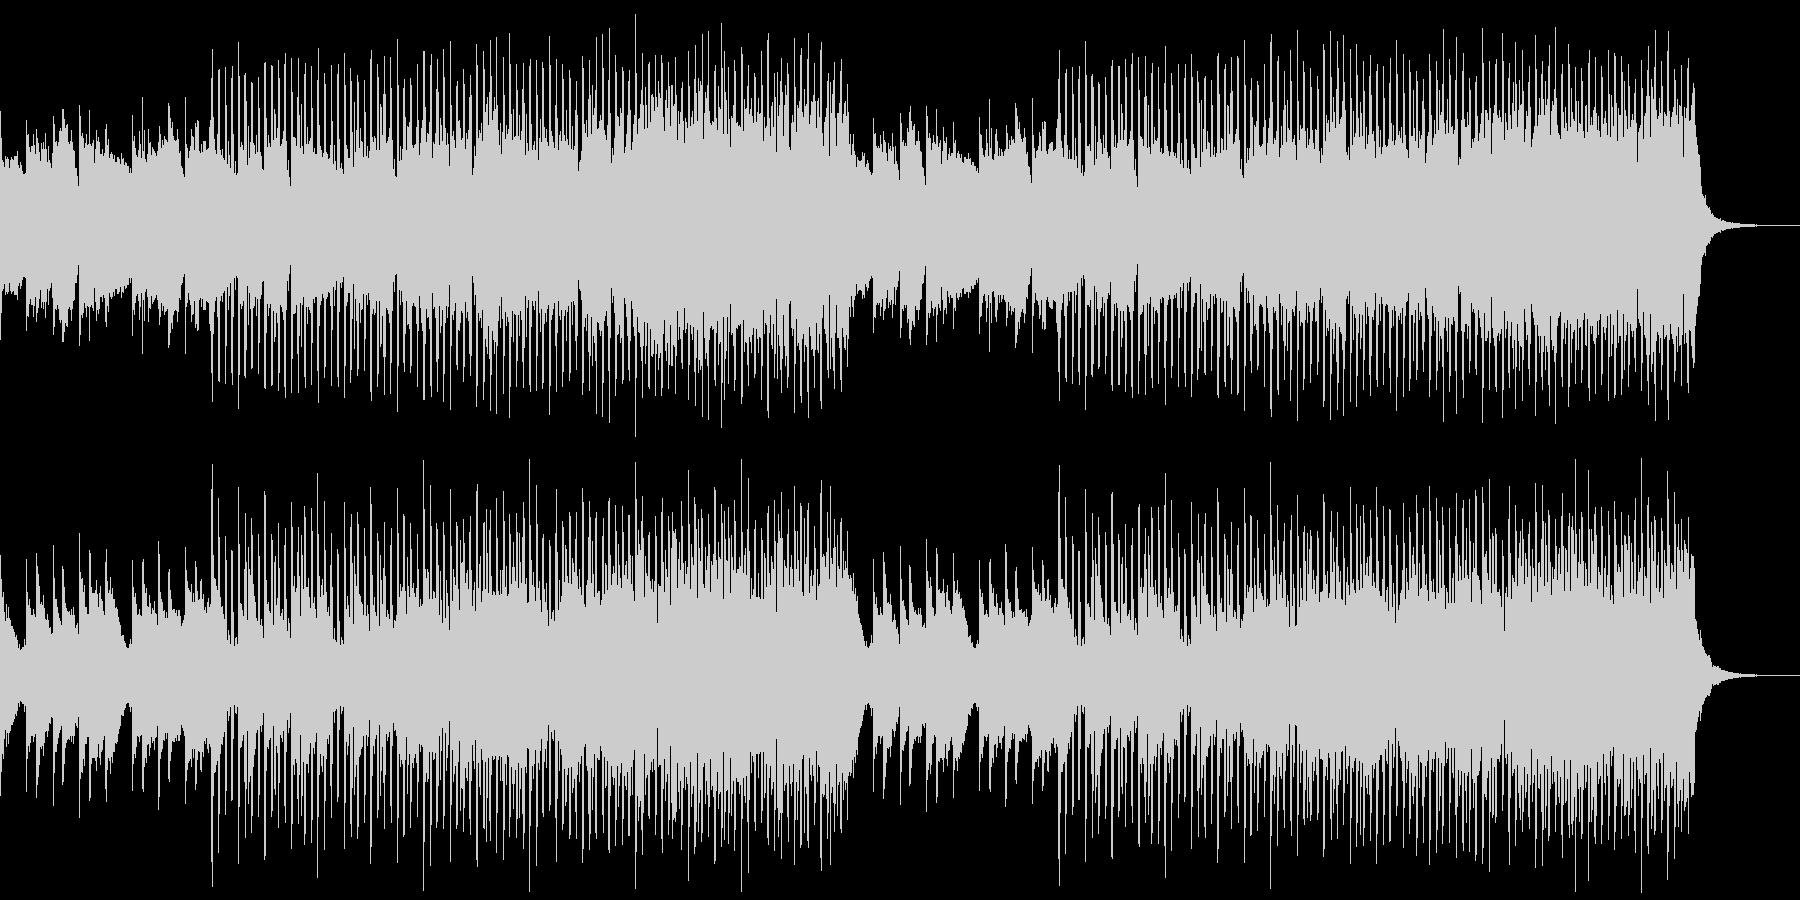 Company VP140, refreshing, 4 hits, piano a's unreproduced waveform